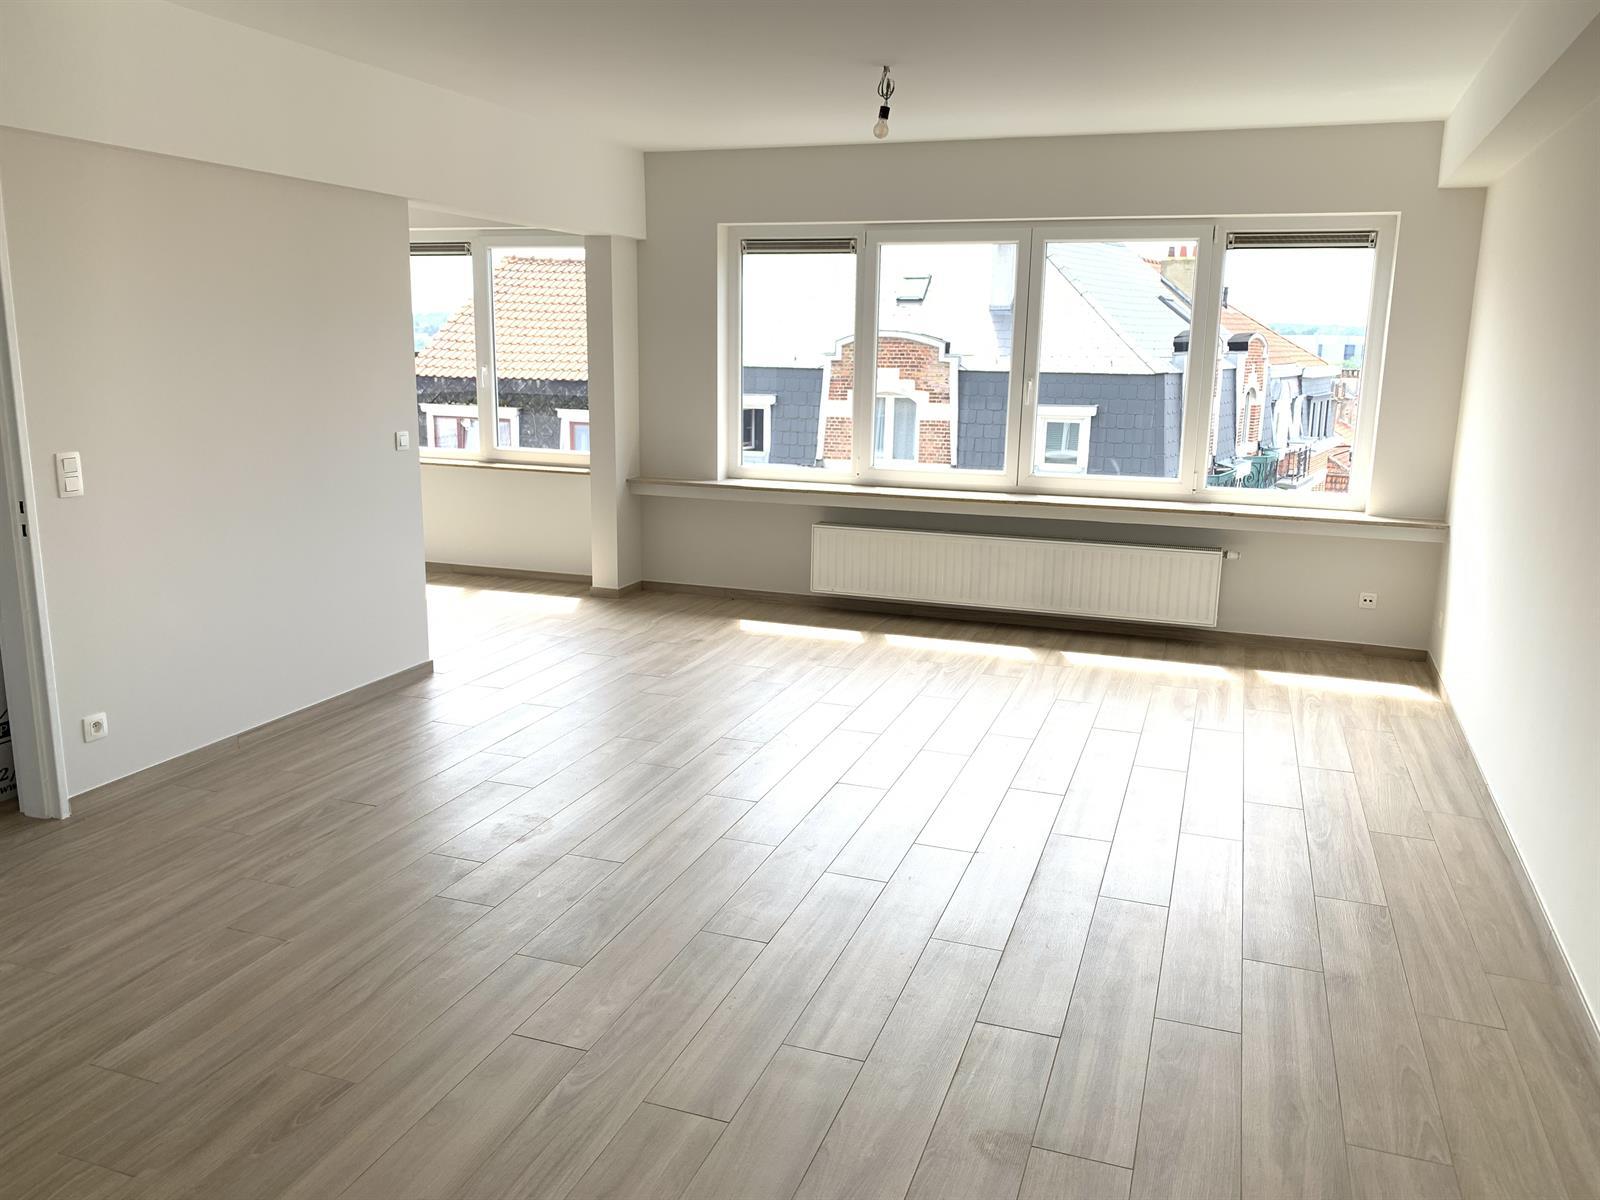 Appartement - Auderghem - #4393981-0